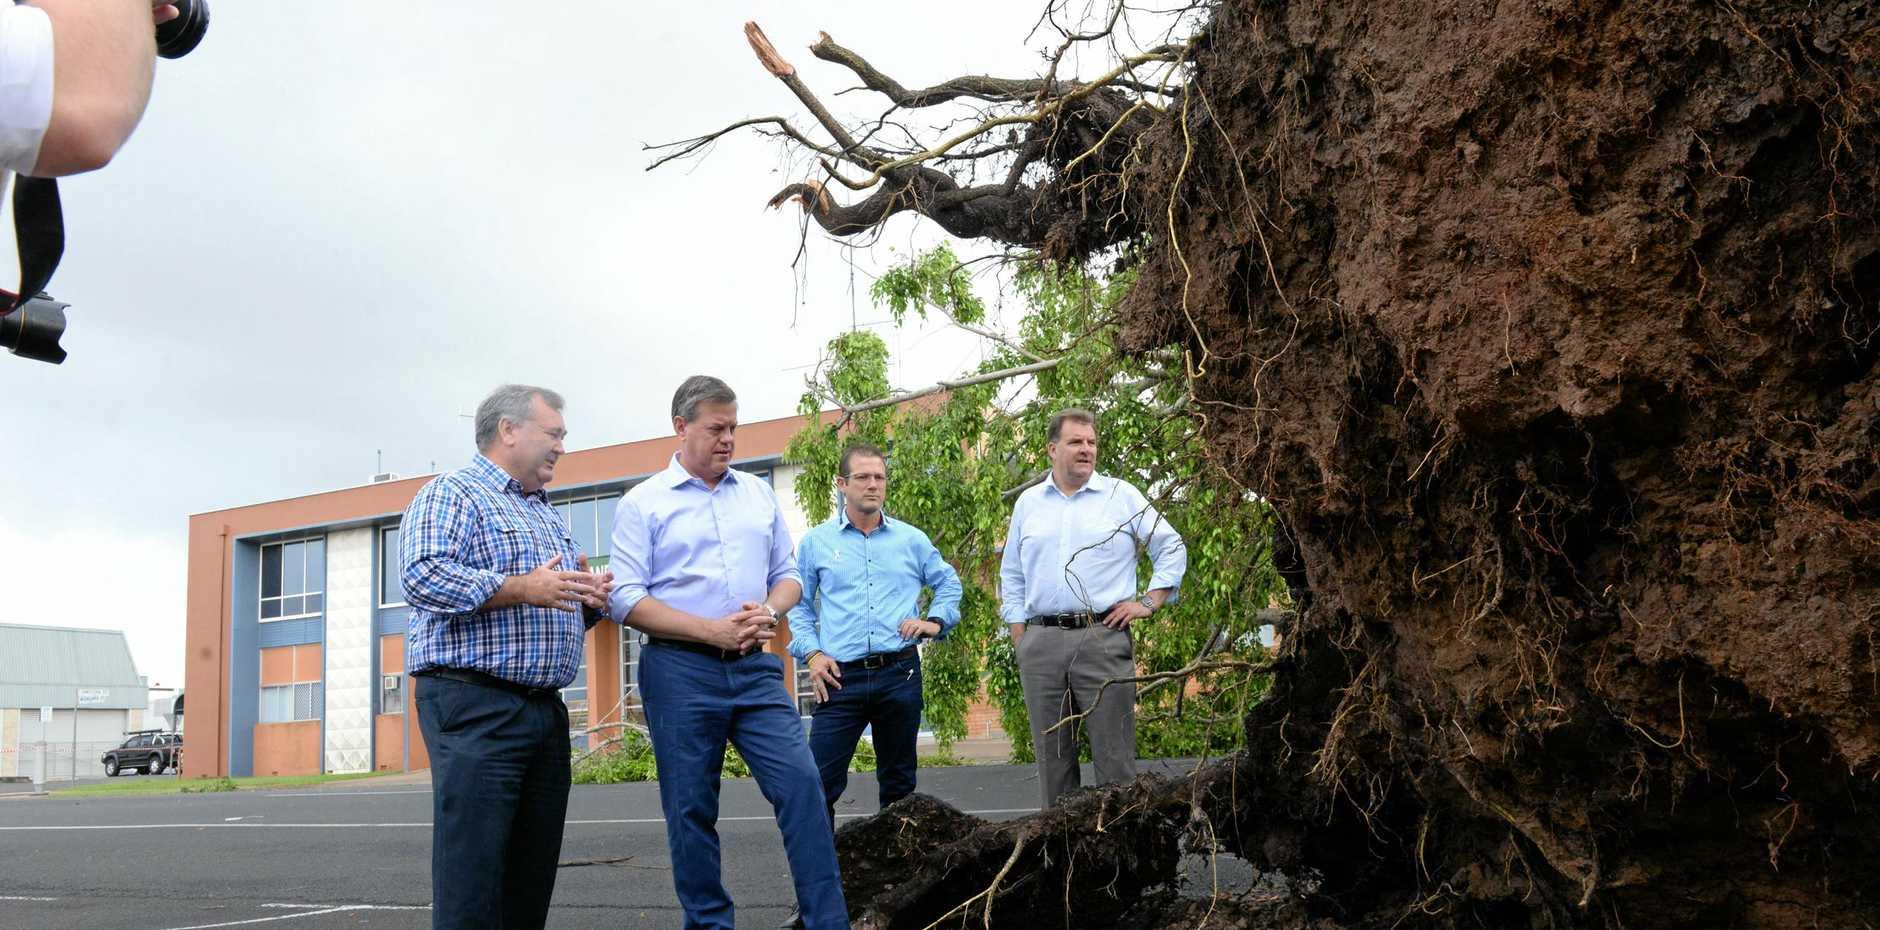 ON TOUR: Opposition Leader Tim Nichols, Mayor Jack Dempsey, candidate David Batt and Burnett MP Stephen Bennett survey the fallen tree outside Centrelink on Woongarra St.